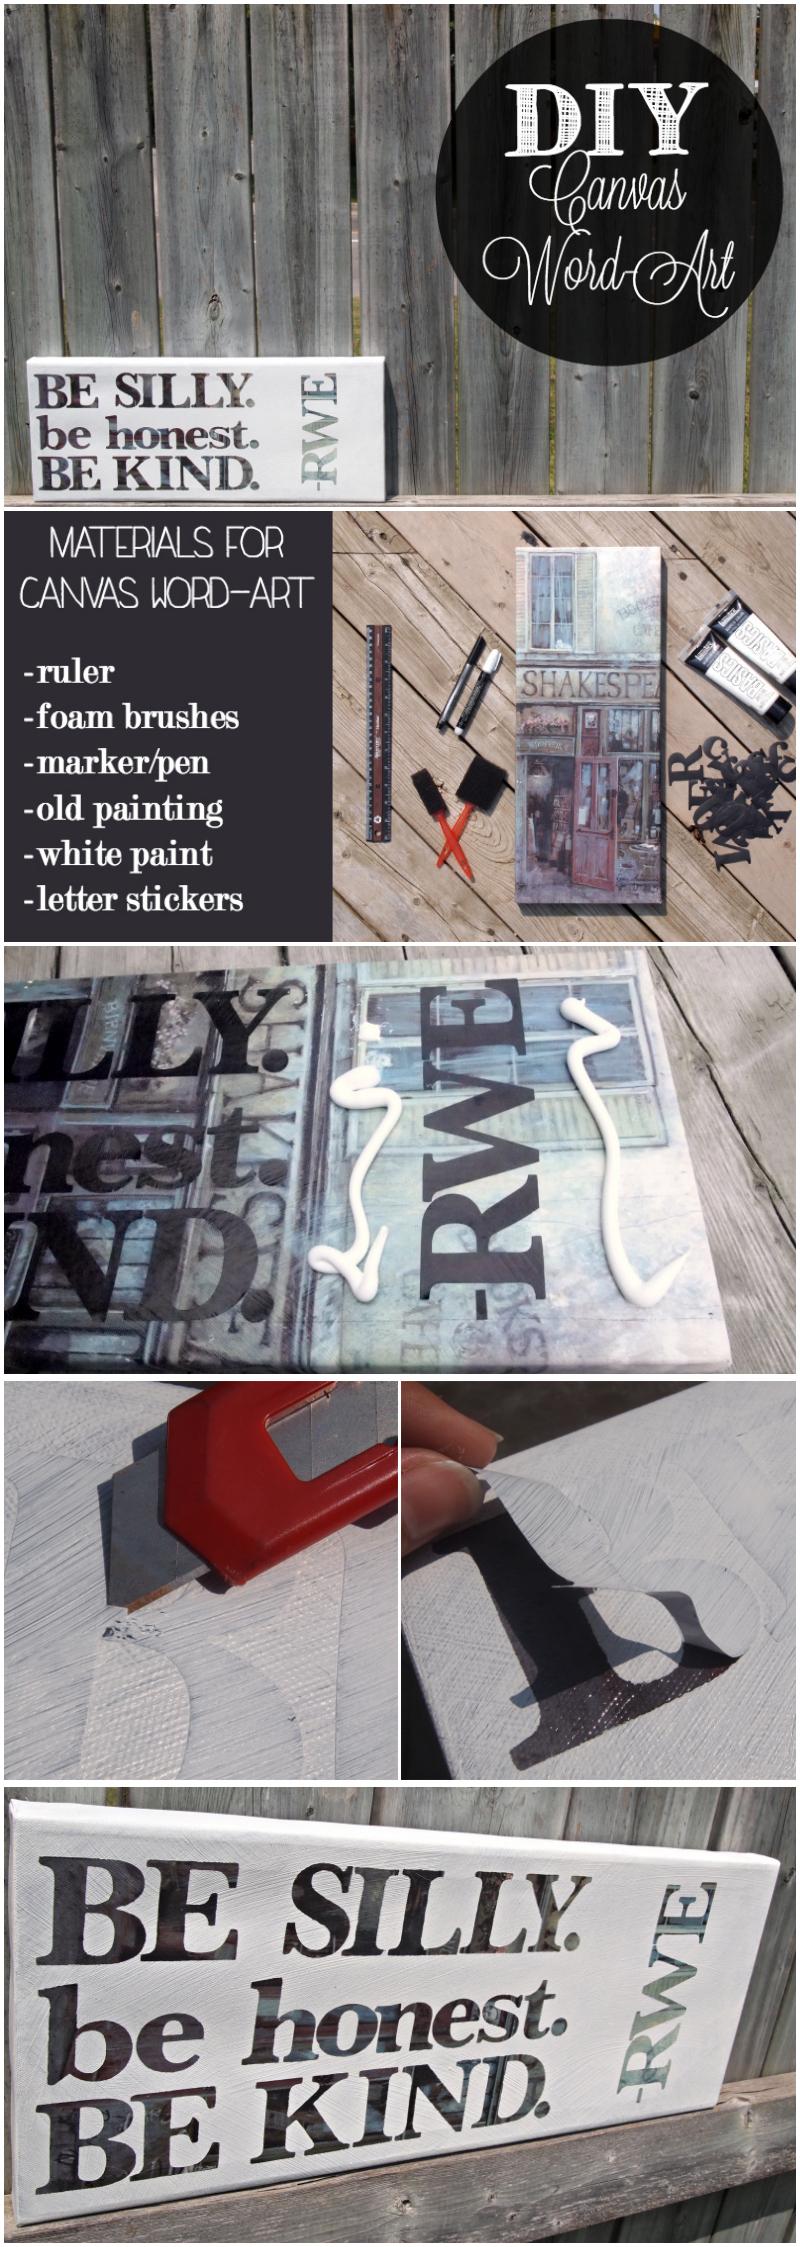 DIY Canvas Word-Art Tutorial